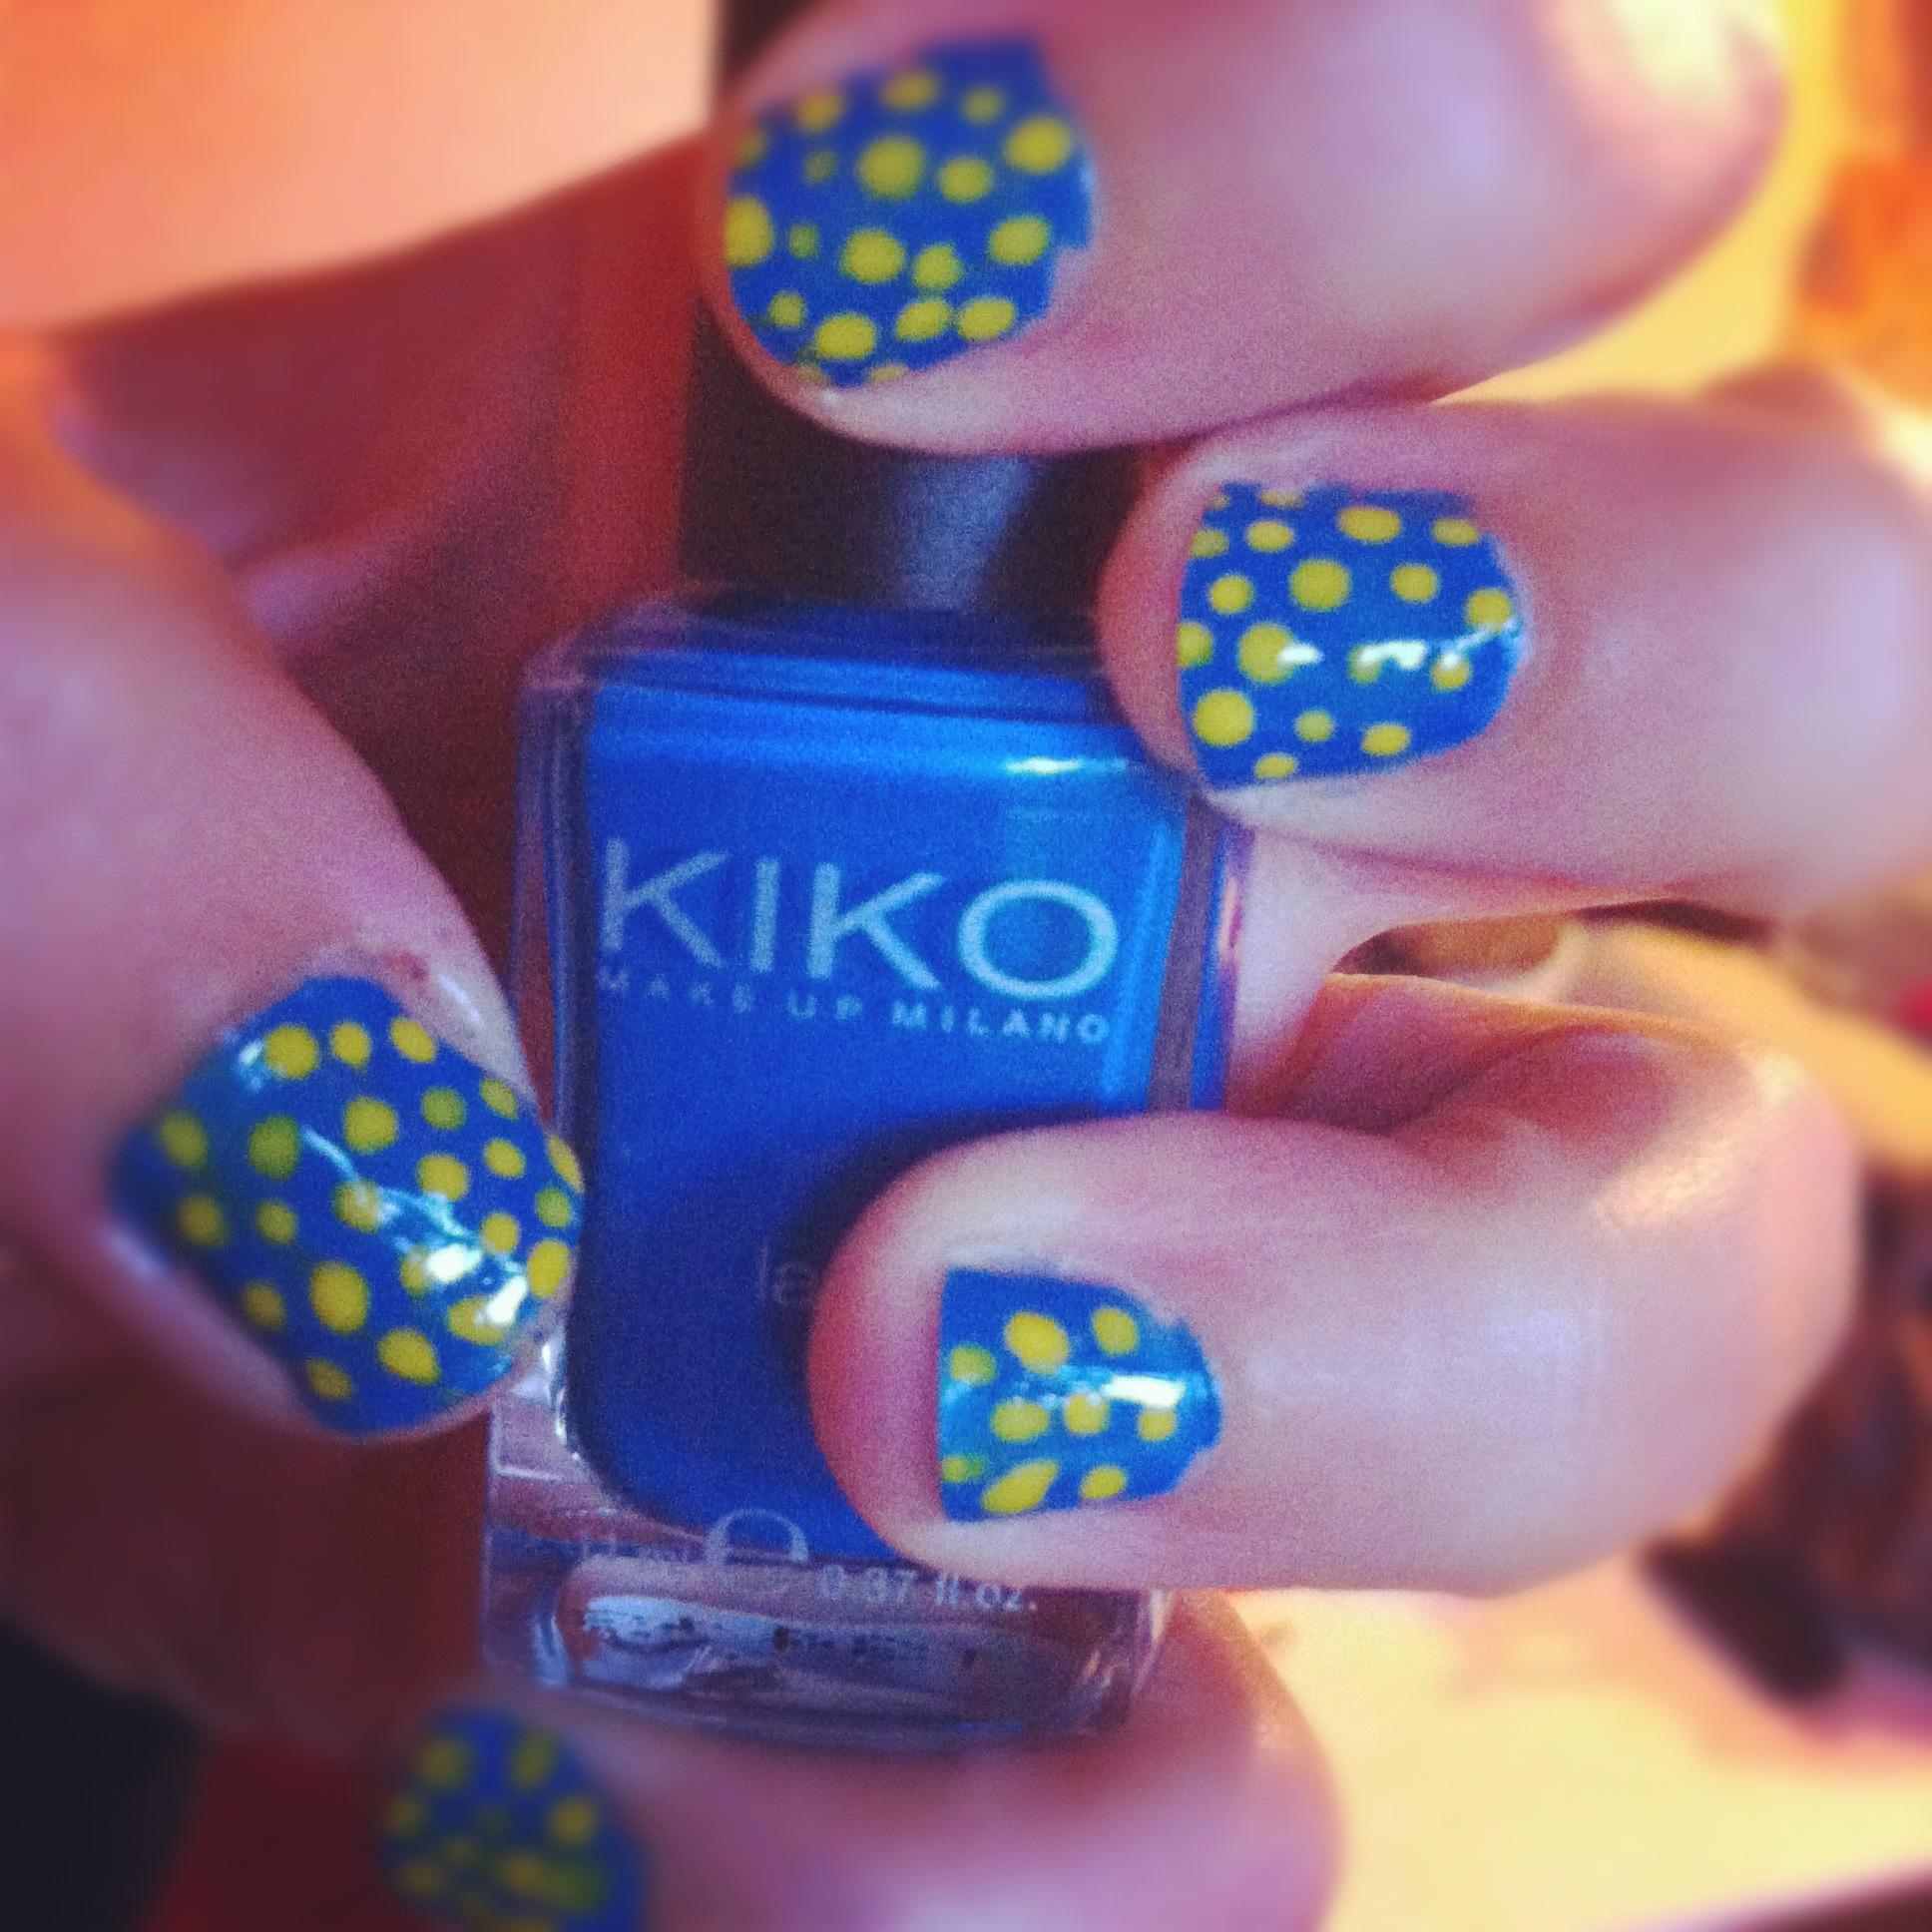 5-conseils-vernis-ongles-18-kiko